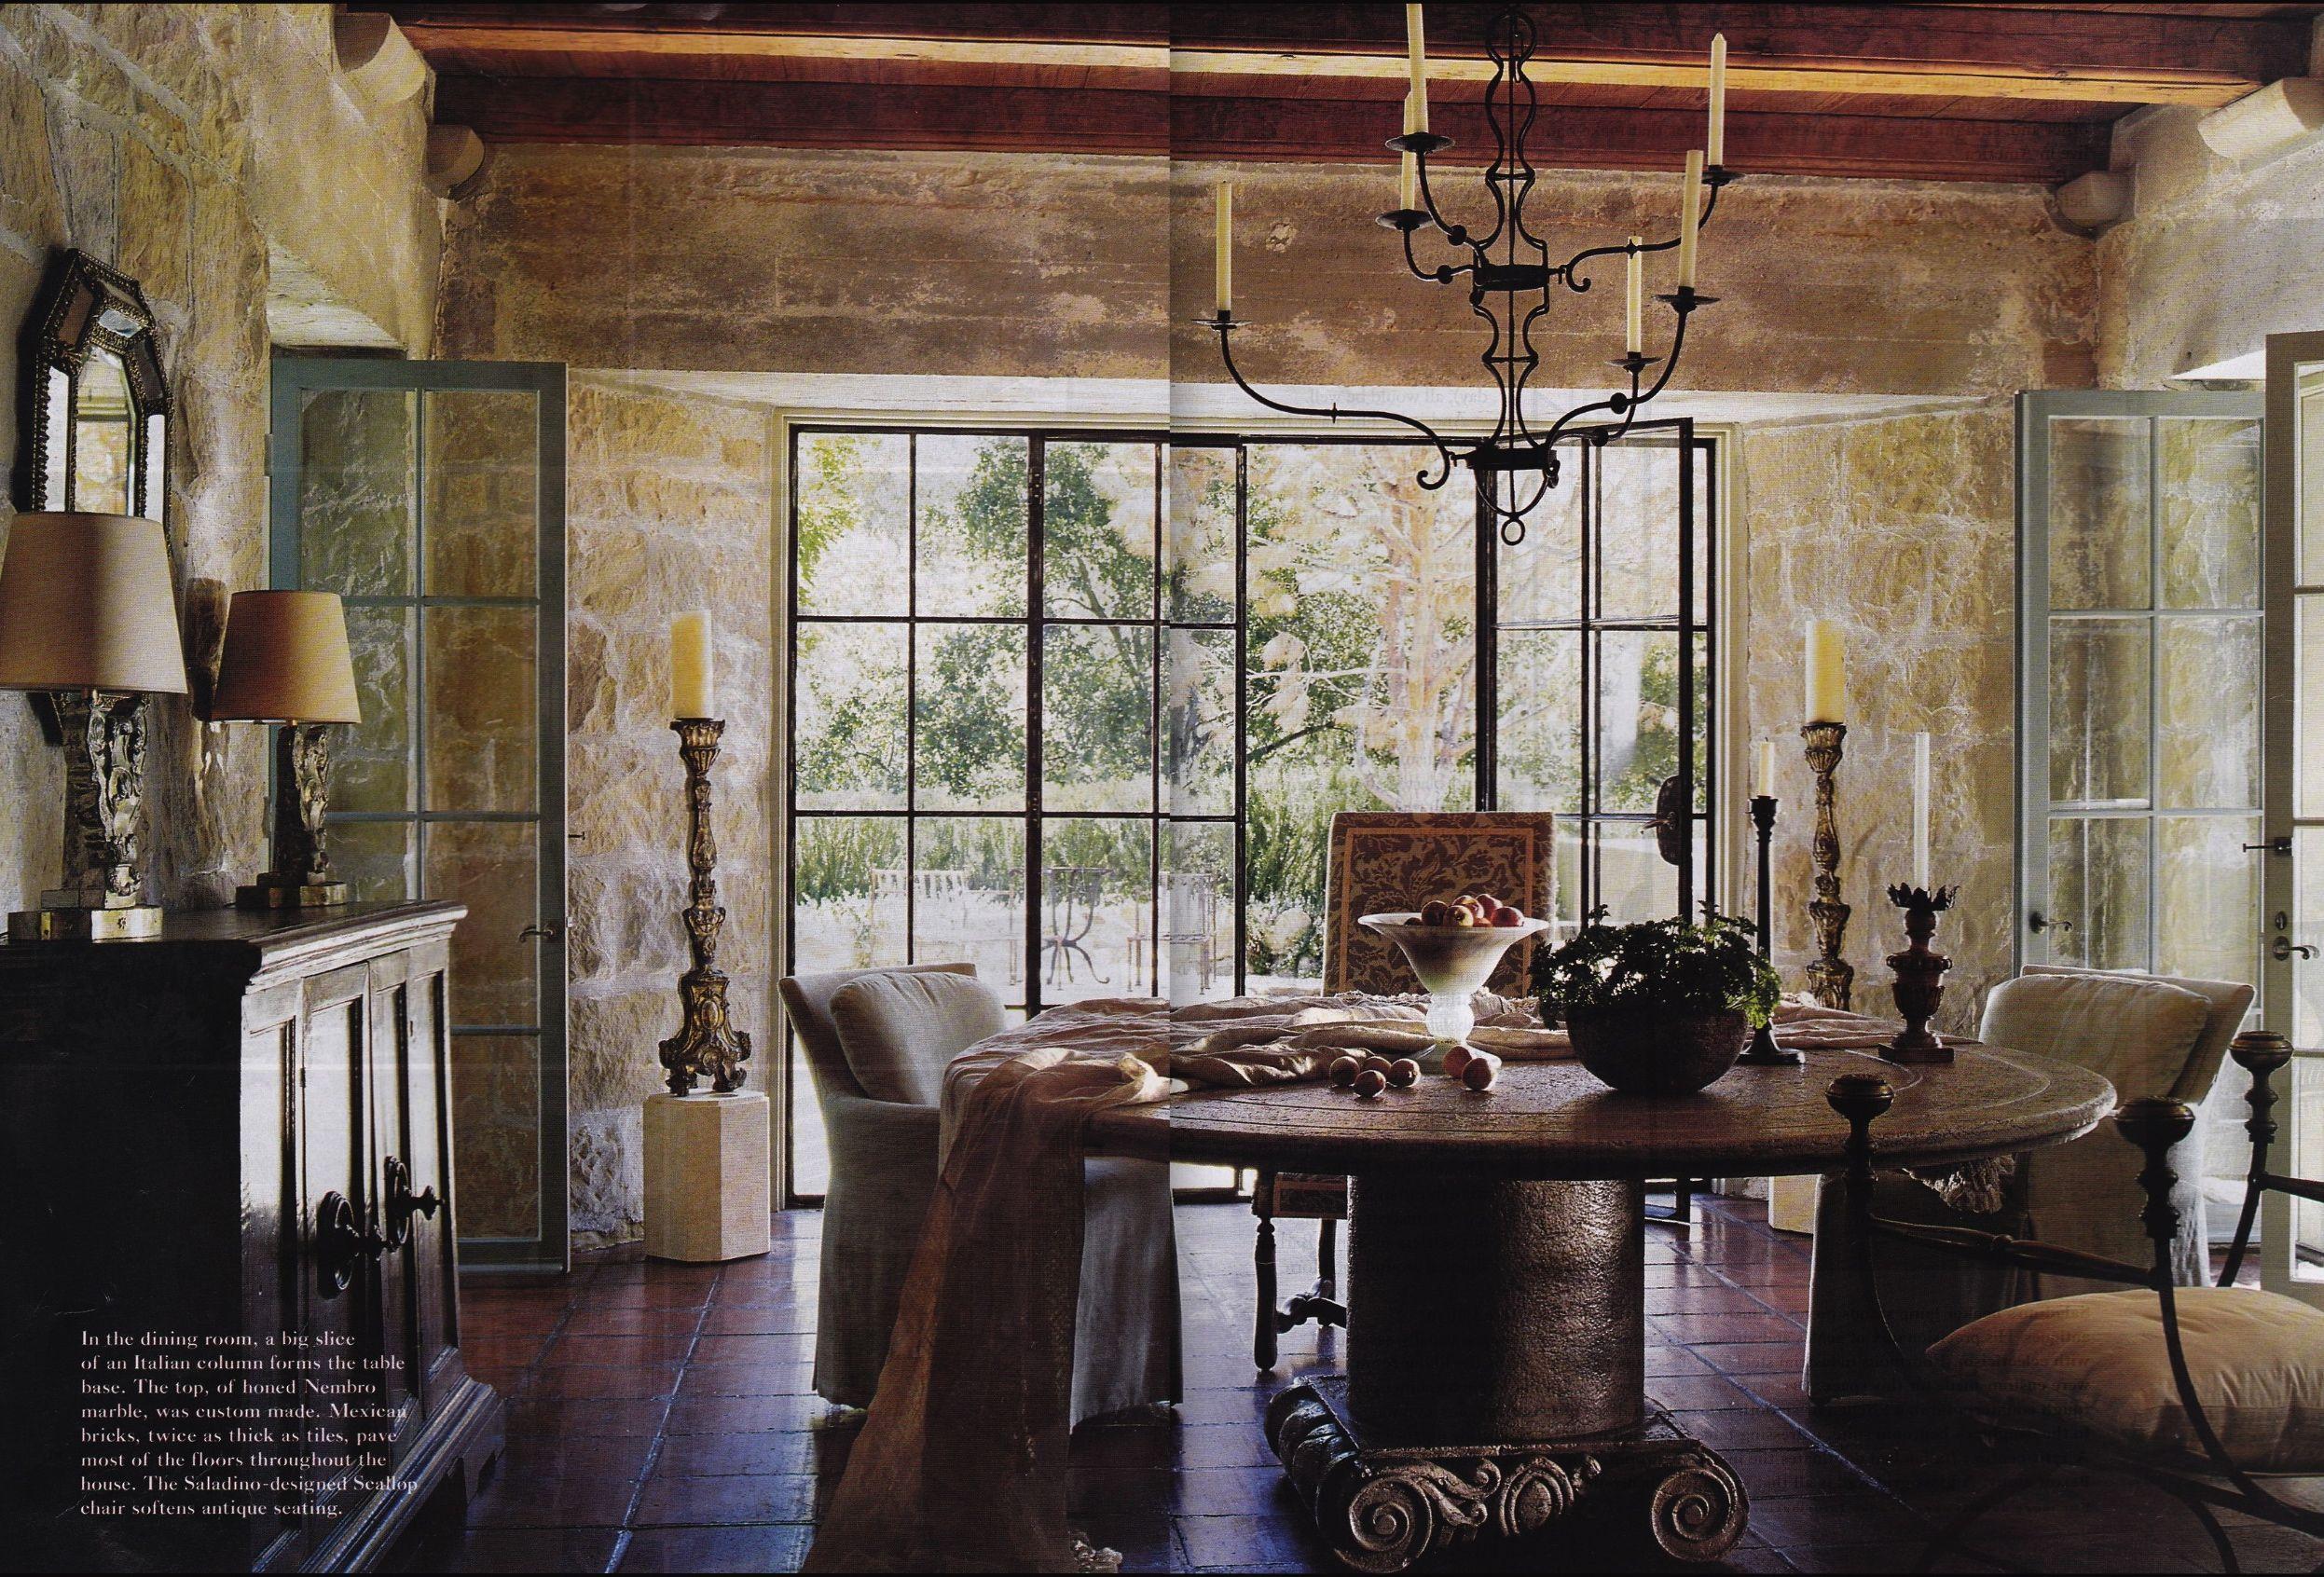 Saladino Style Cristopher Worthland Interiors Rooms I Love Pinterest Santa Barbara